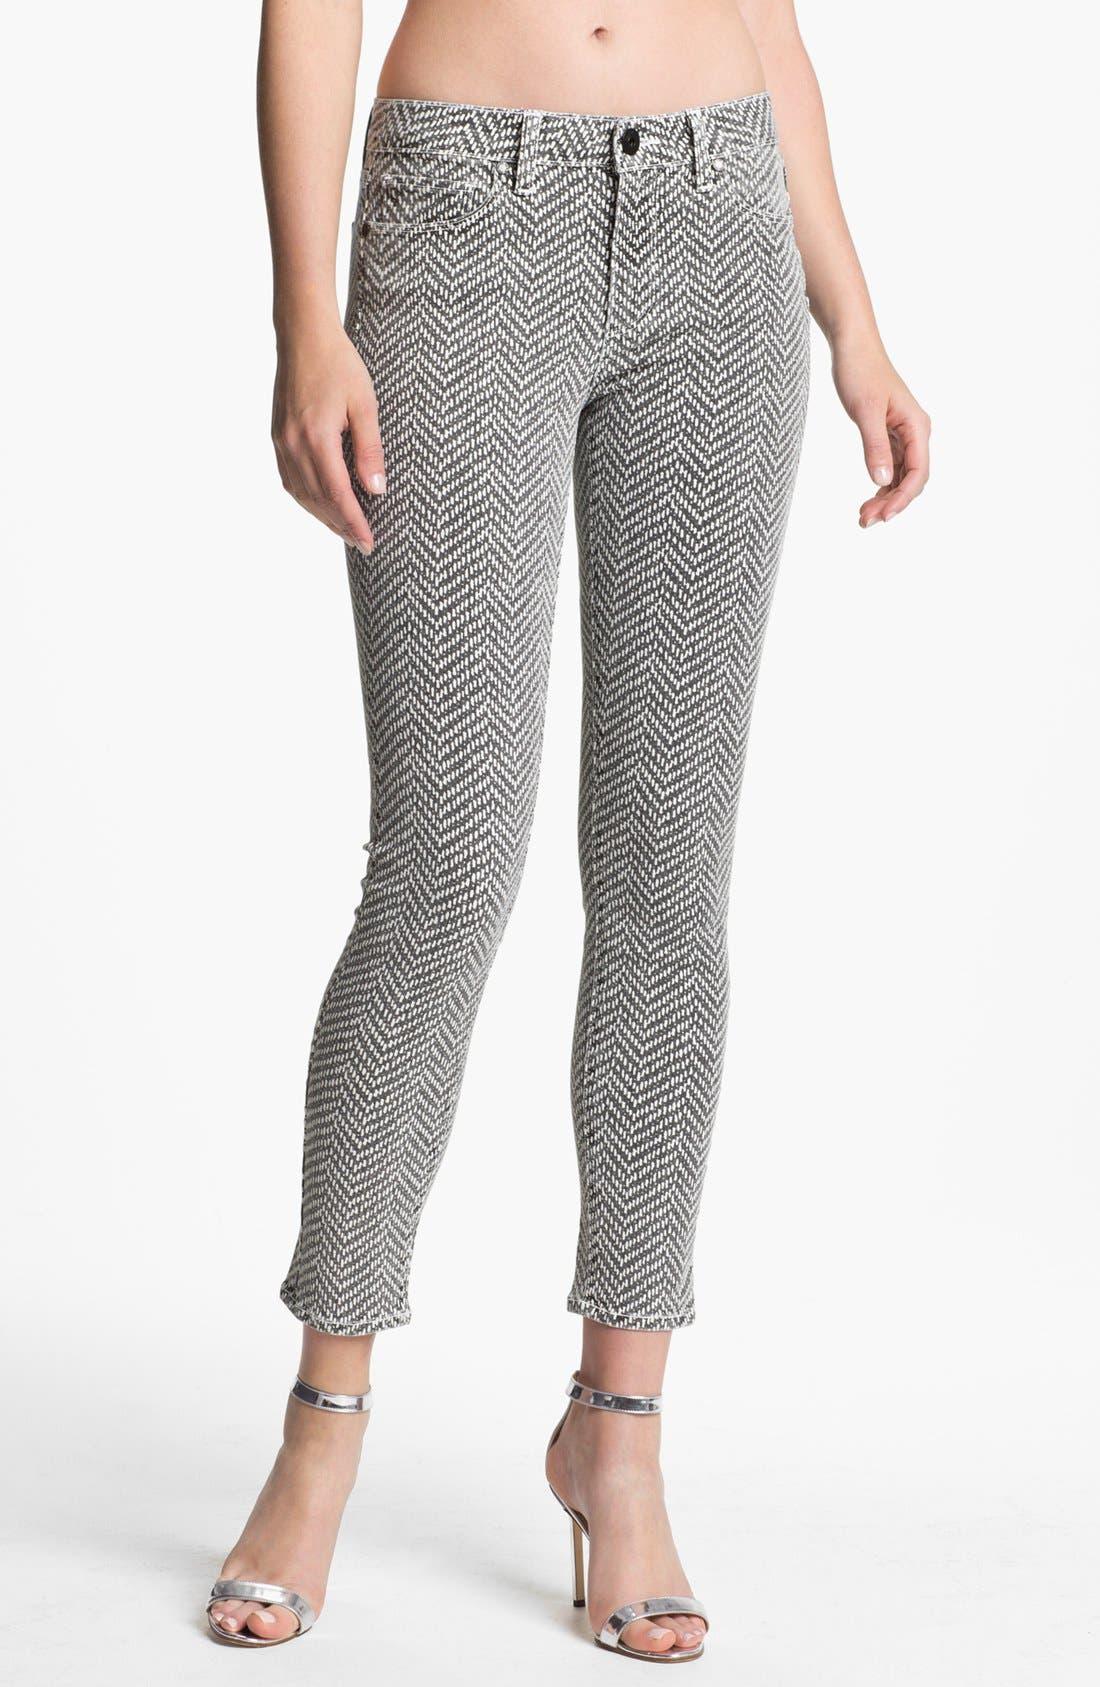 Alternate Image 1 Selected - Paige Denim 'Hoxton' Ankle Jeans (White/Black)